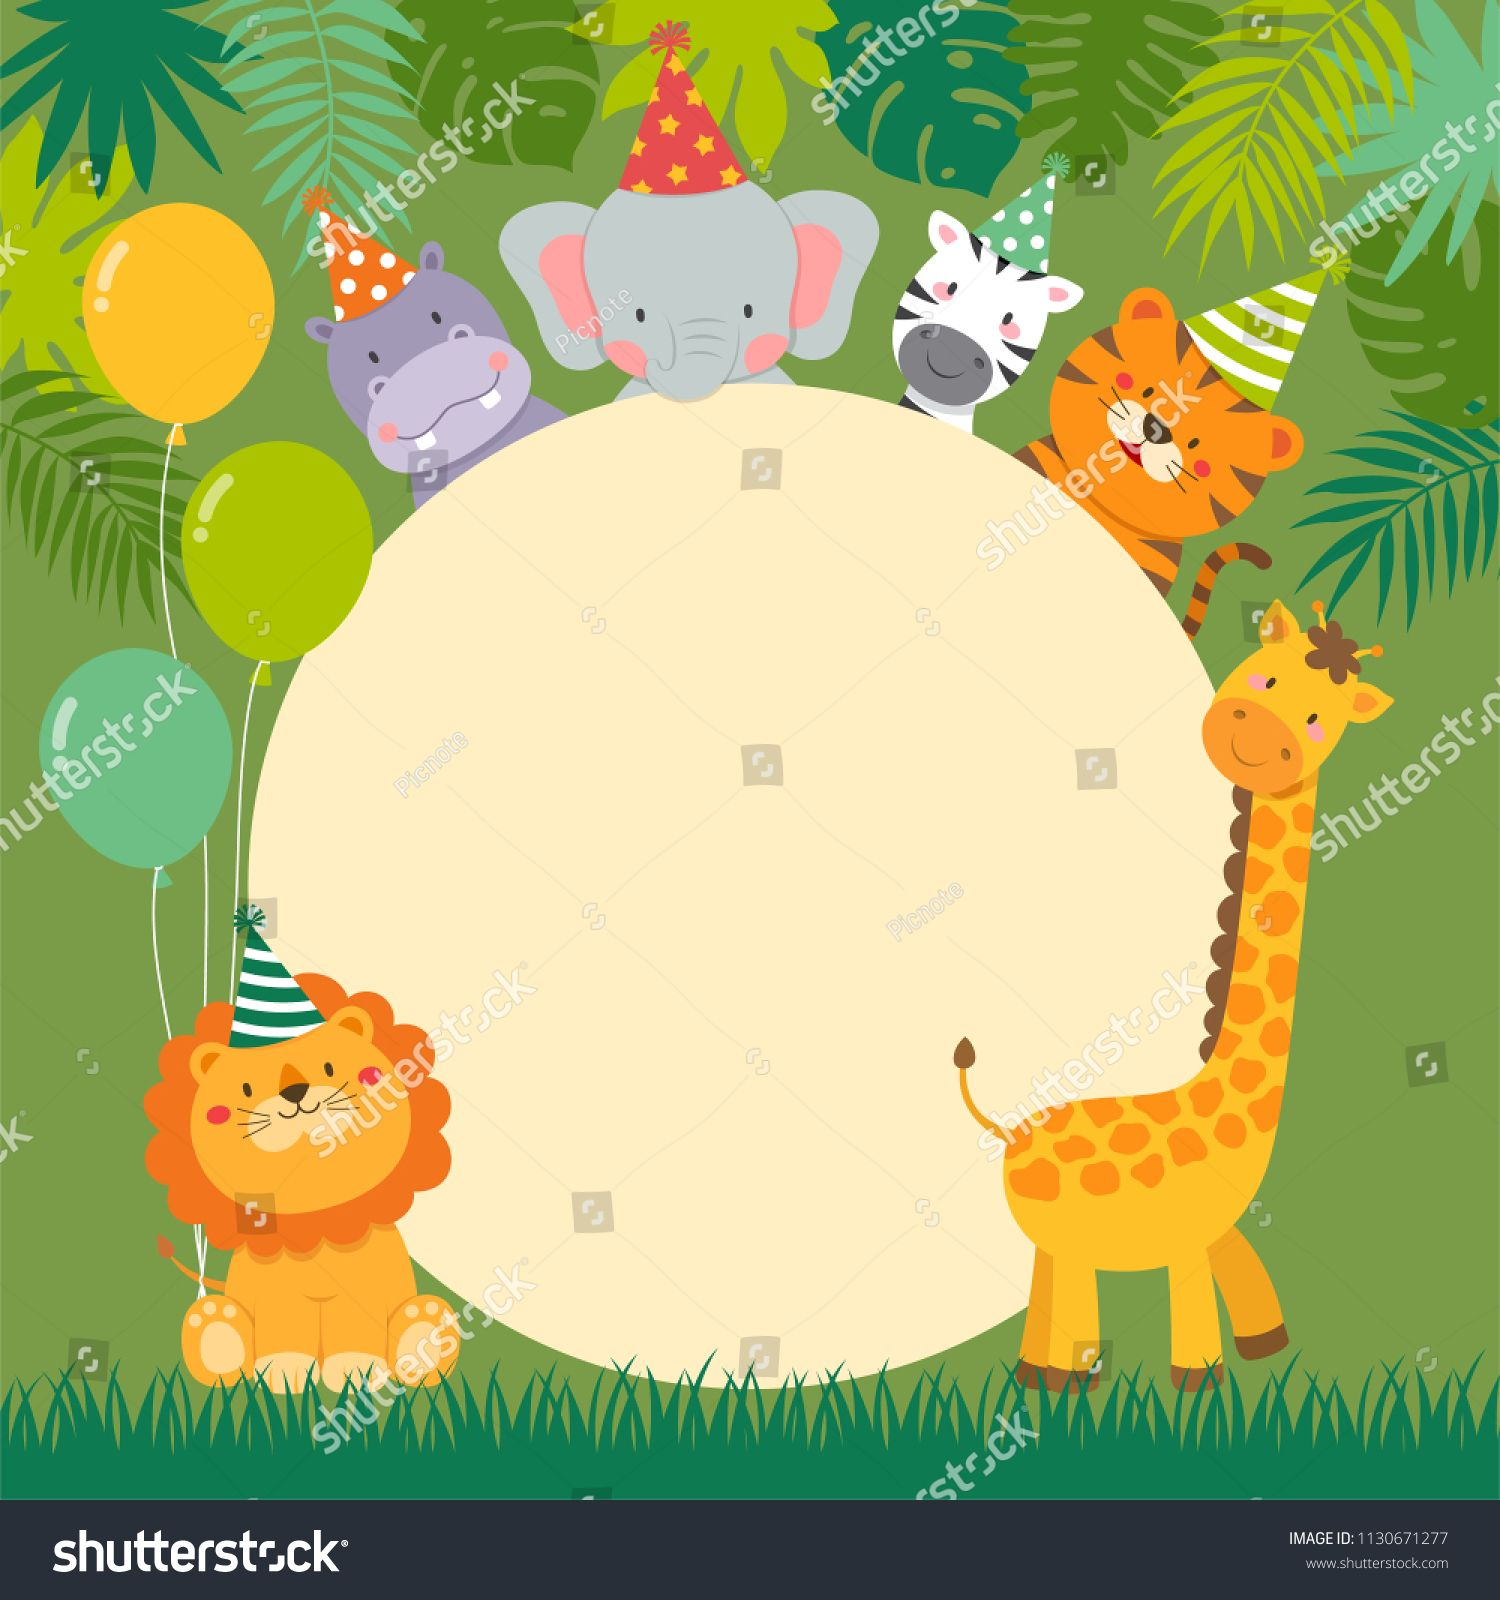 Cute Wildlife Animals Cartoon With Circle Border For Party Invitation Card Templatecartoon Circle Animals Cute Wildlife Animals Cartoon Animals Wildlife